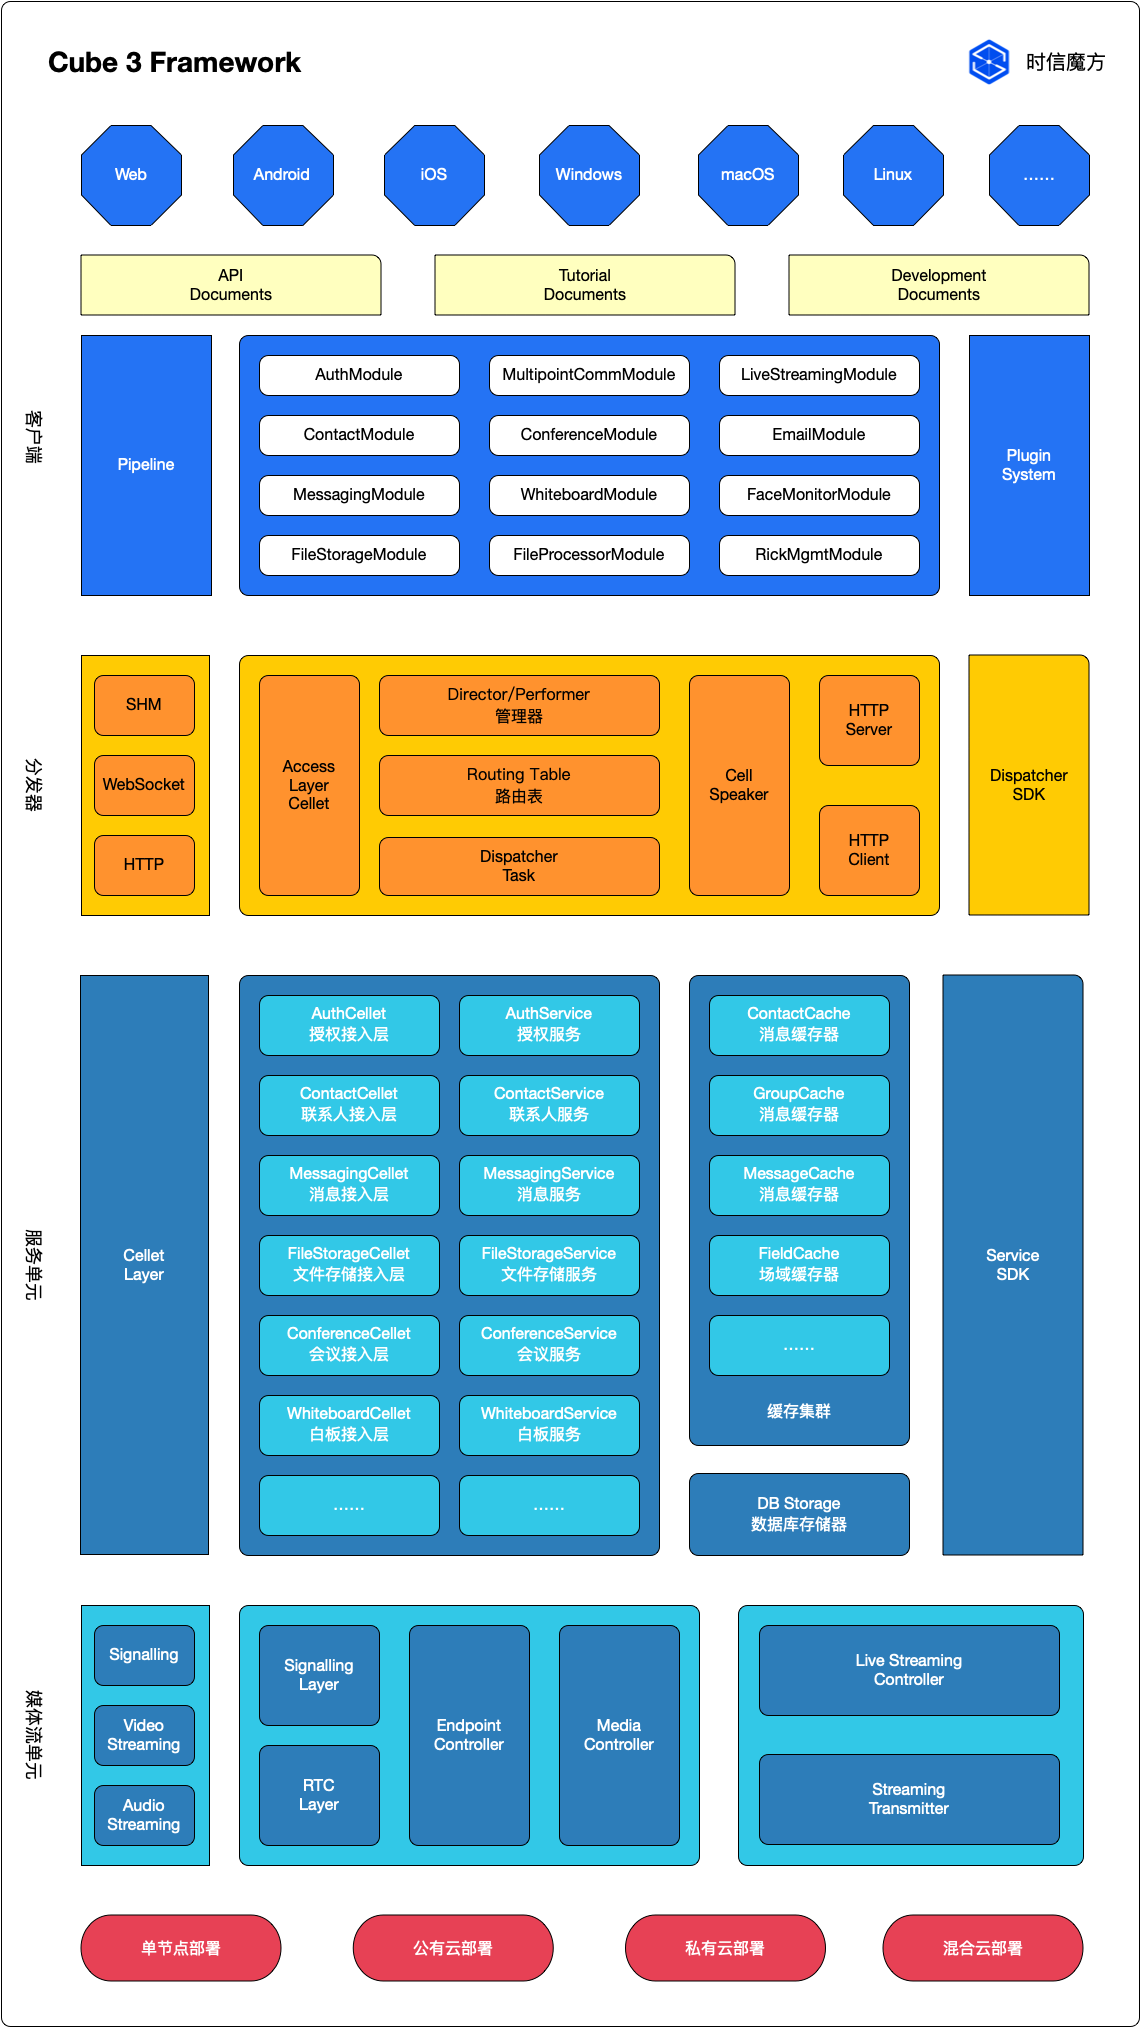 Cube 3 Framework